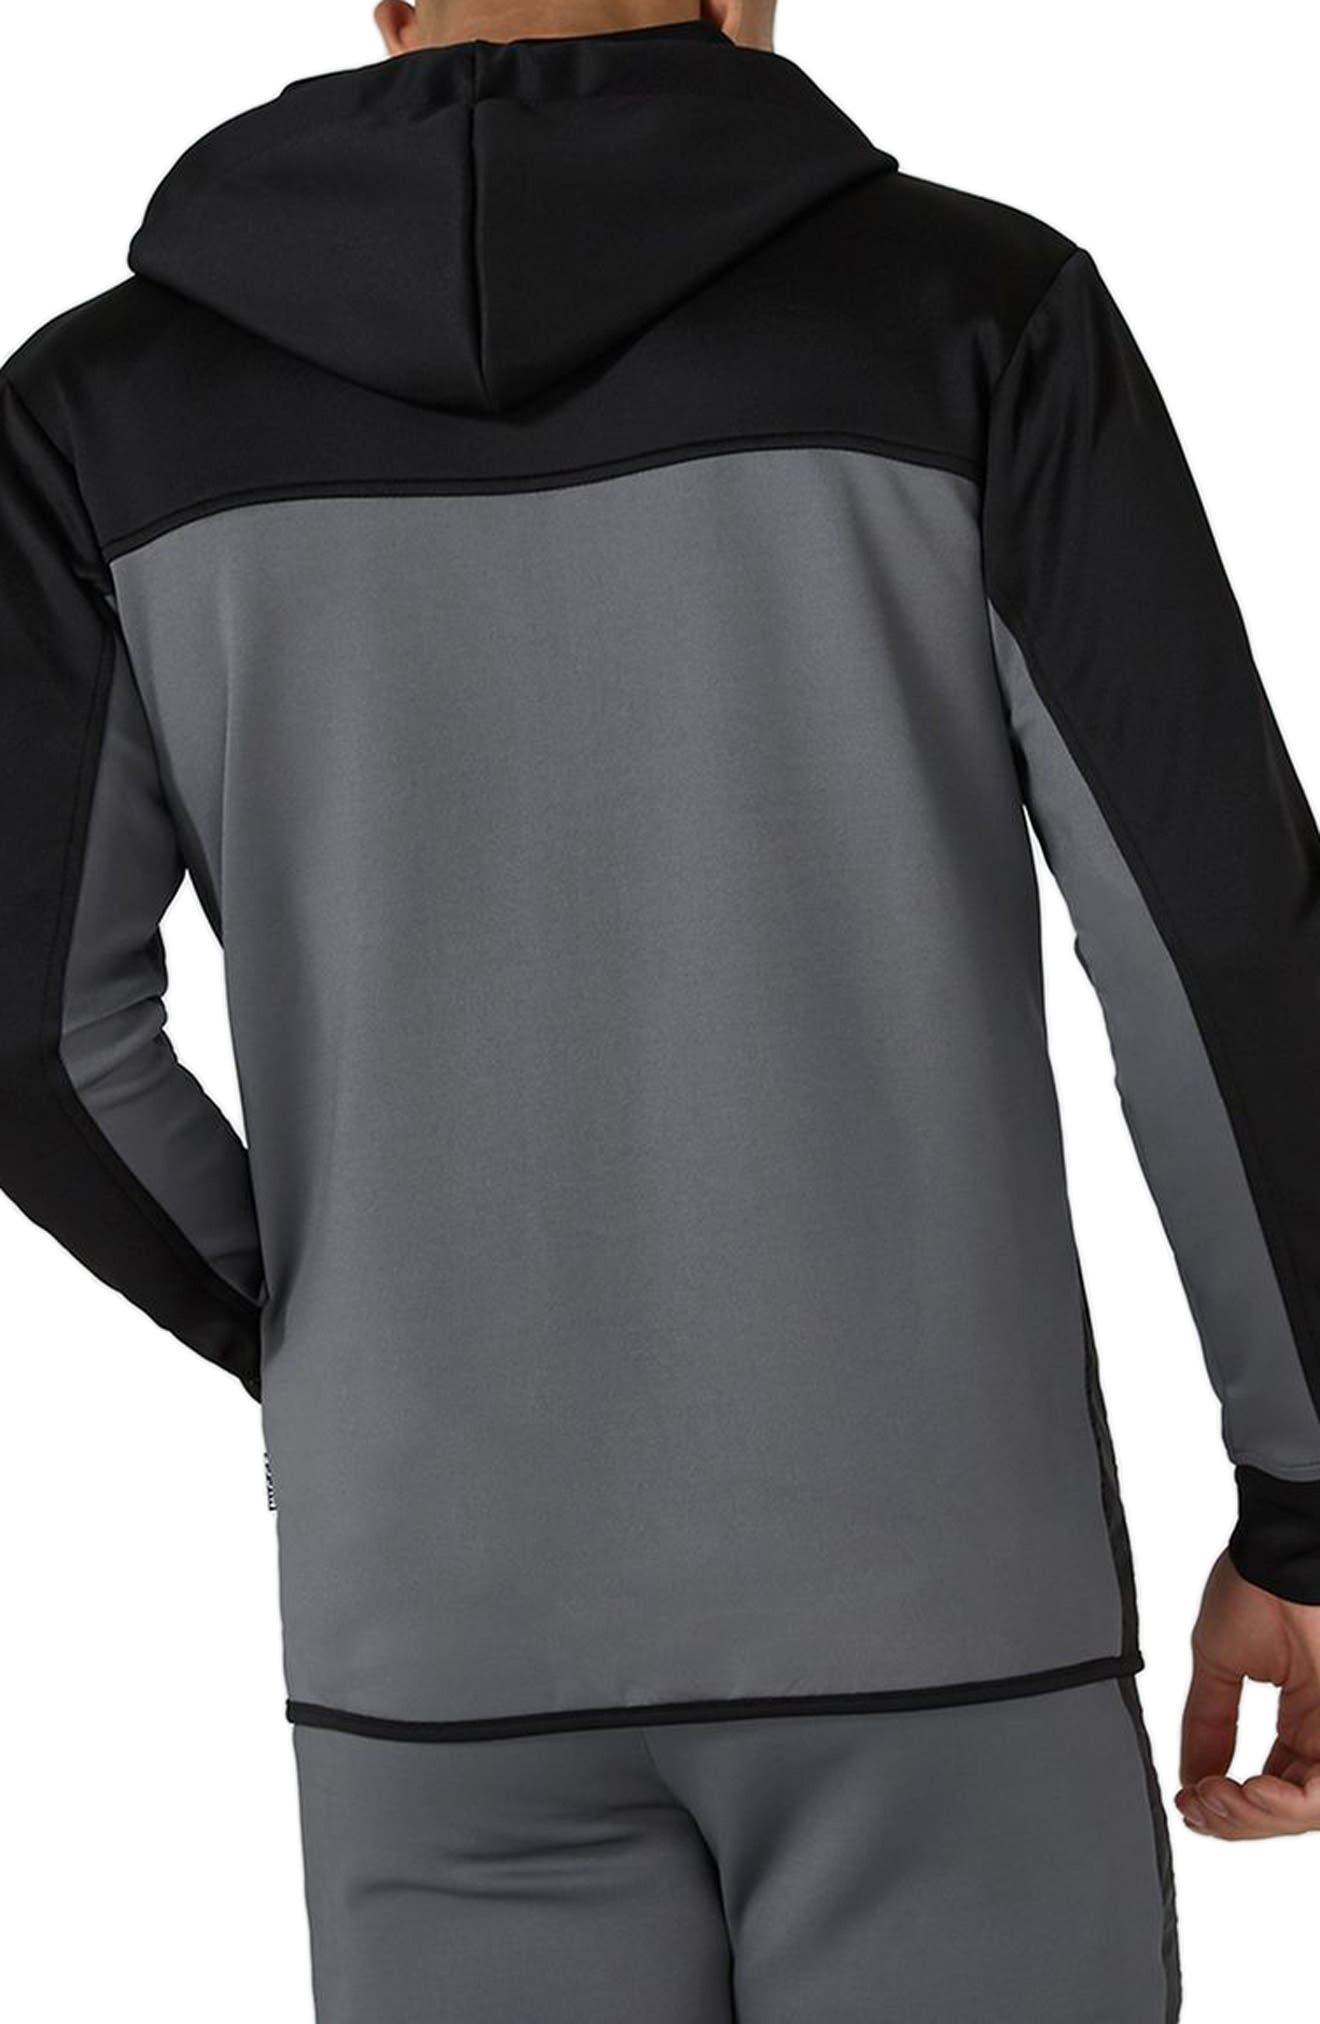 Topshop NICCE Hybrid Track Jacket,                             Alternate thumbnail 2, color,                             BLACK MULTI